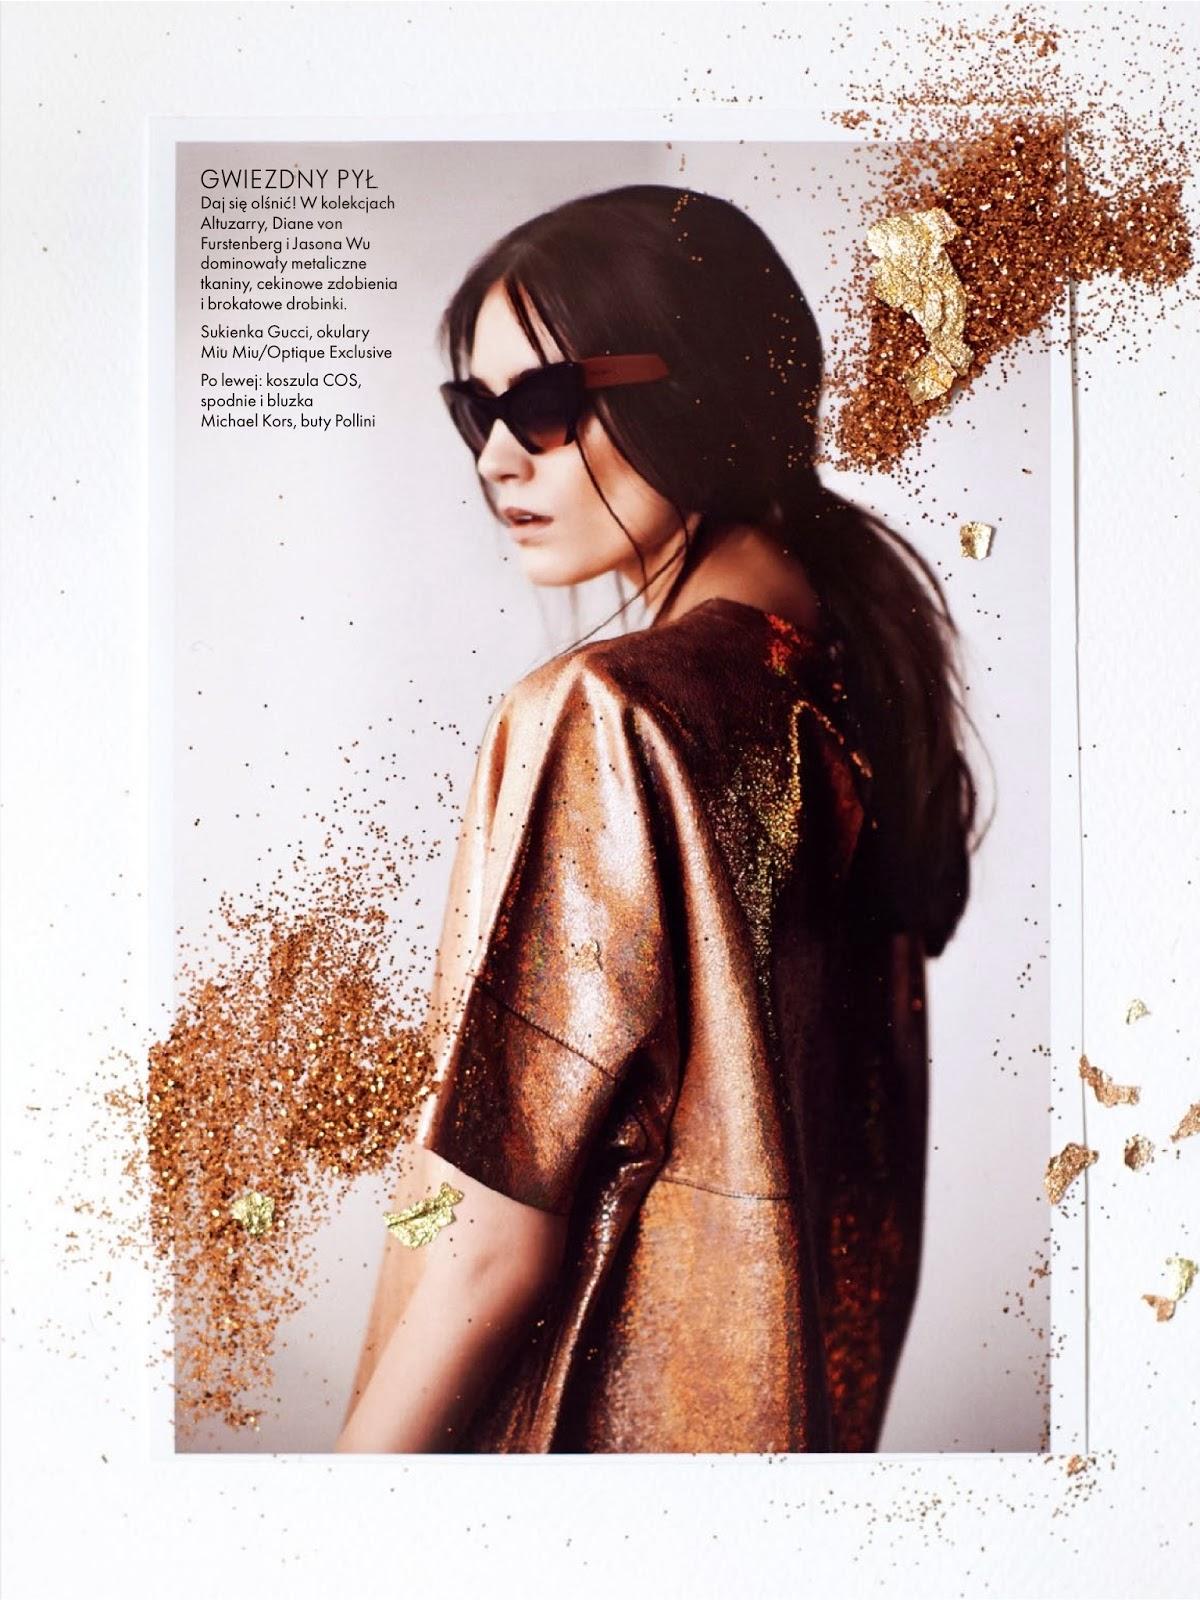 Patrycja Gardygajlo HQ Pictures Elle Poland Magazine Photoshoot March 2014 By Marcin Kempski